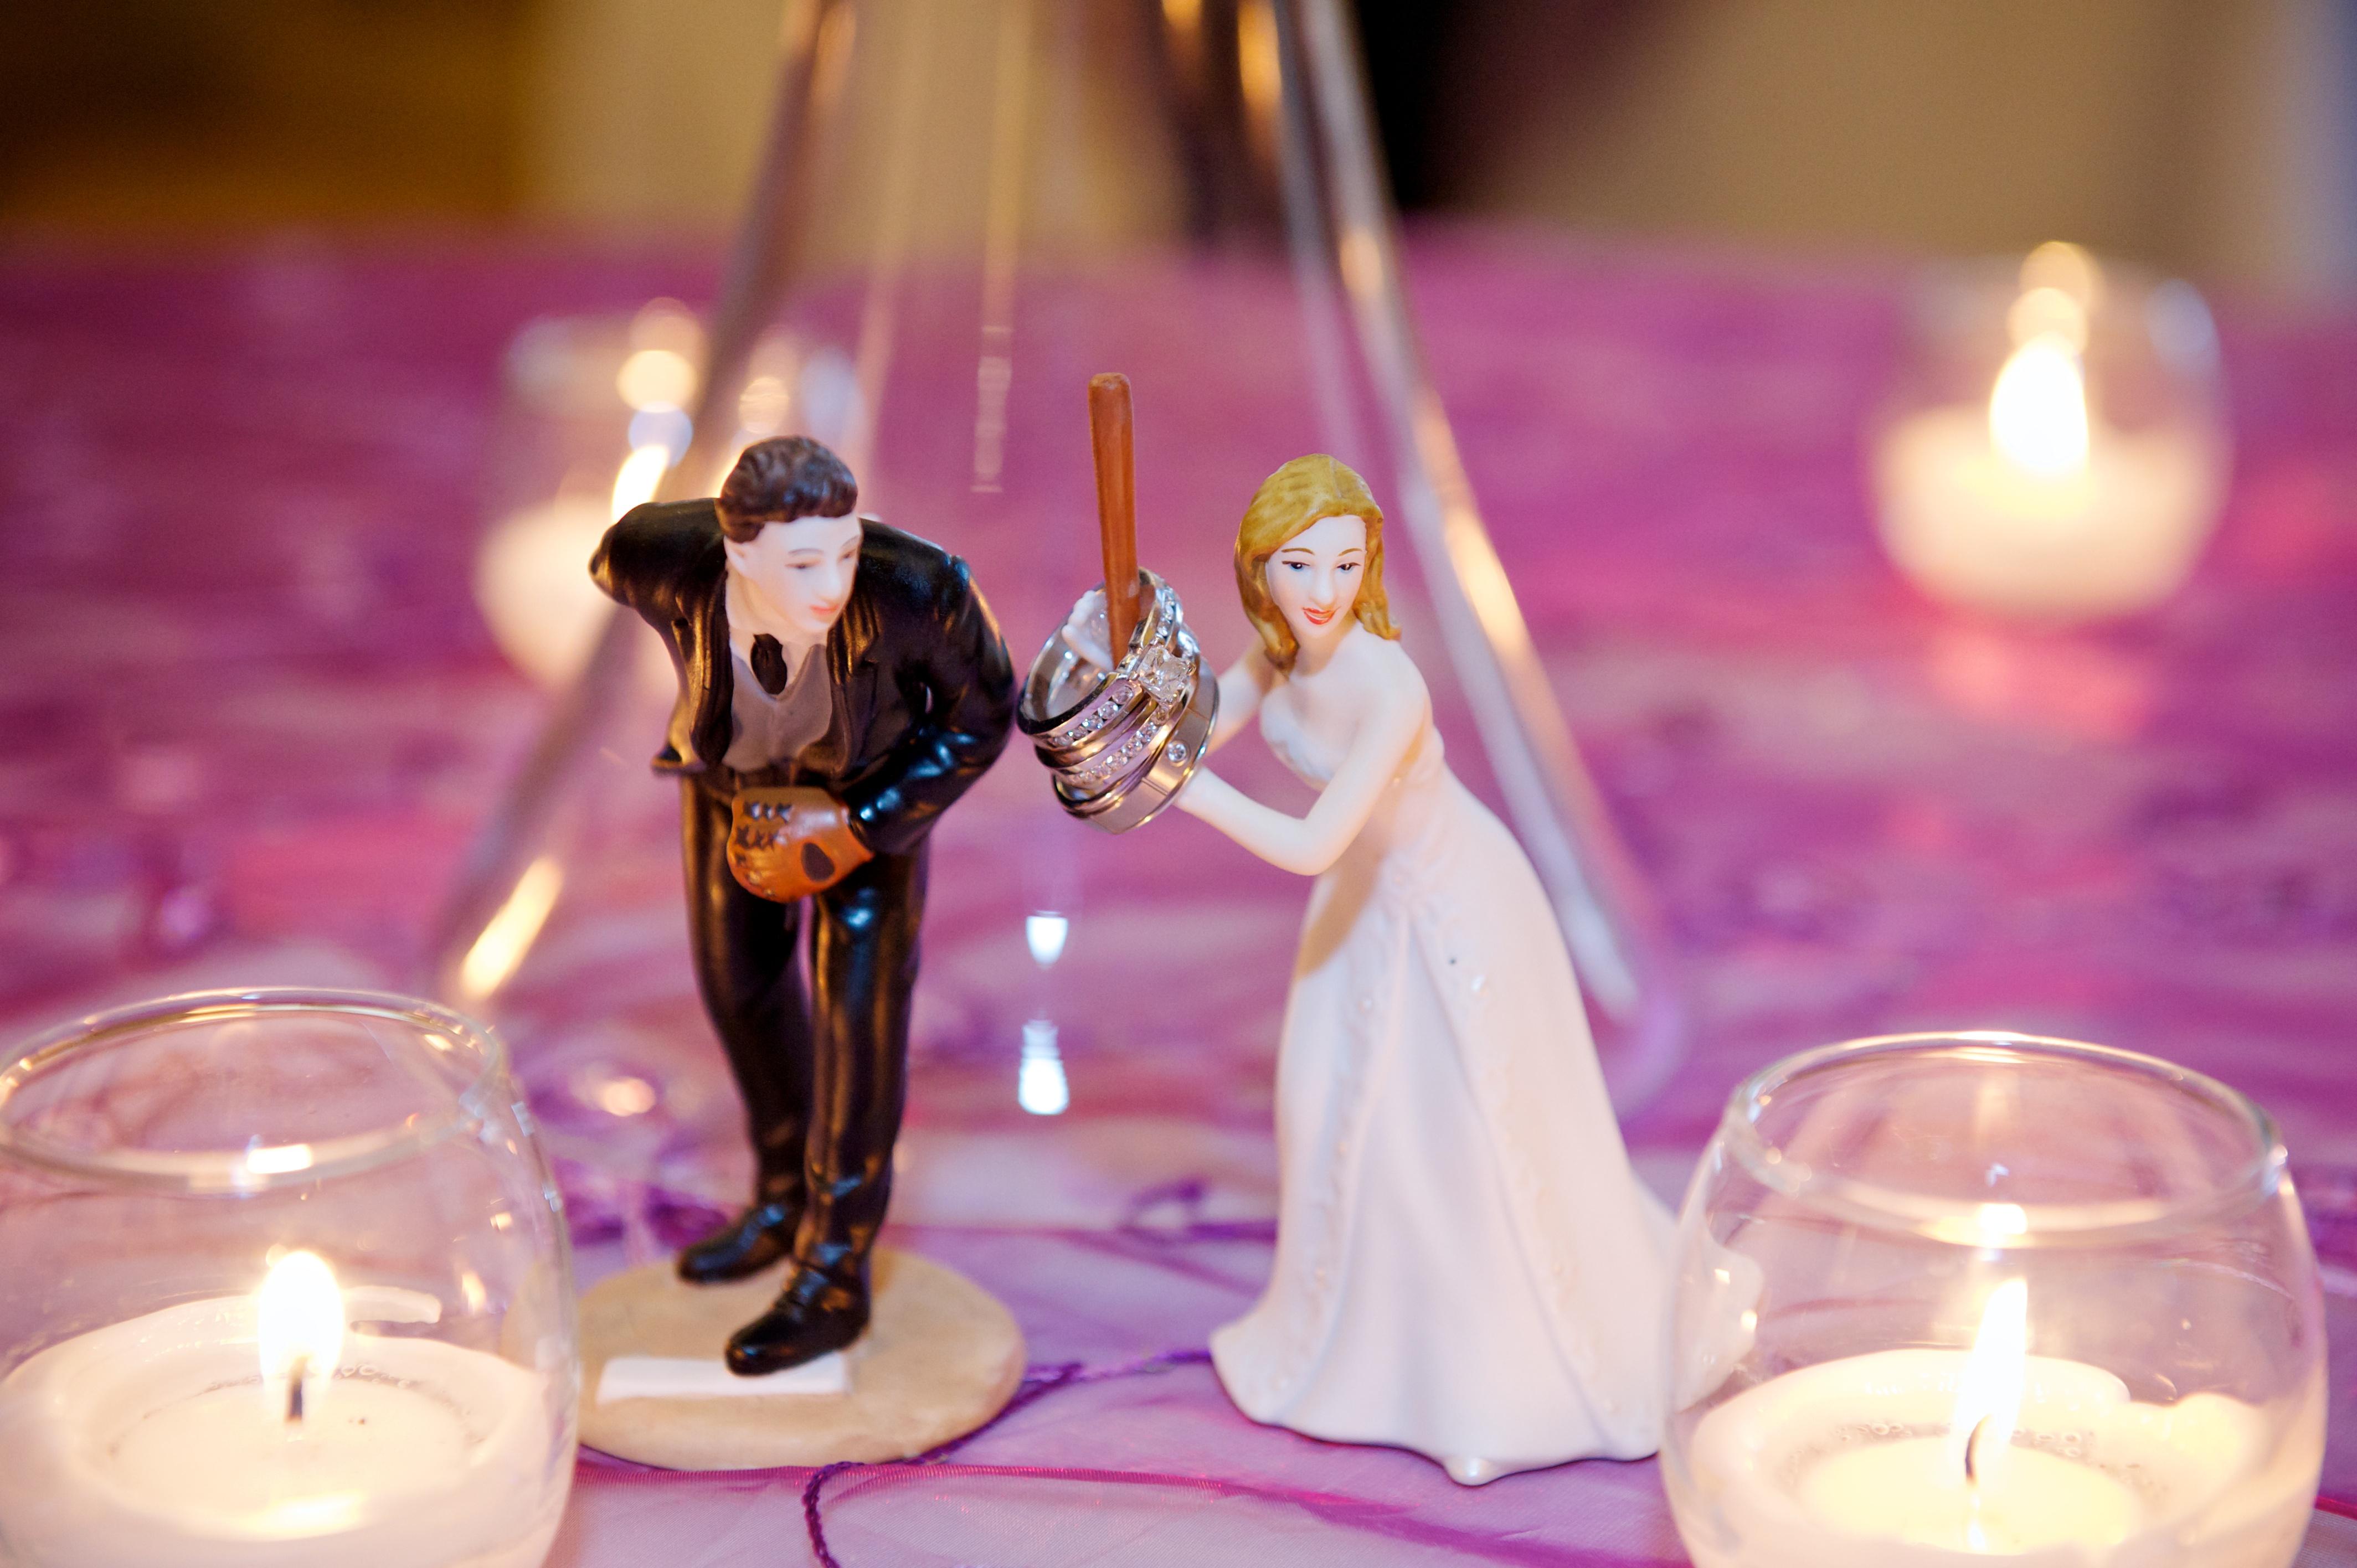 Jennifer and Eddie Wedding Rings_ Jessica_Elizabeth Photographers